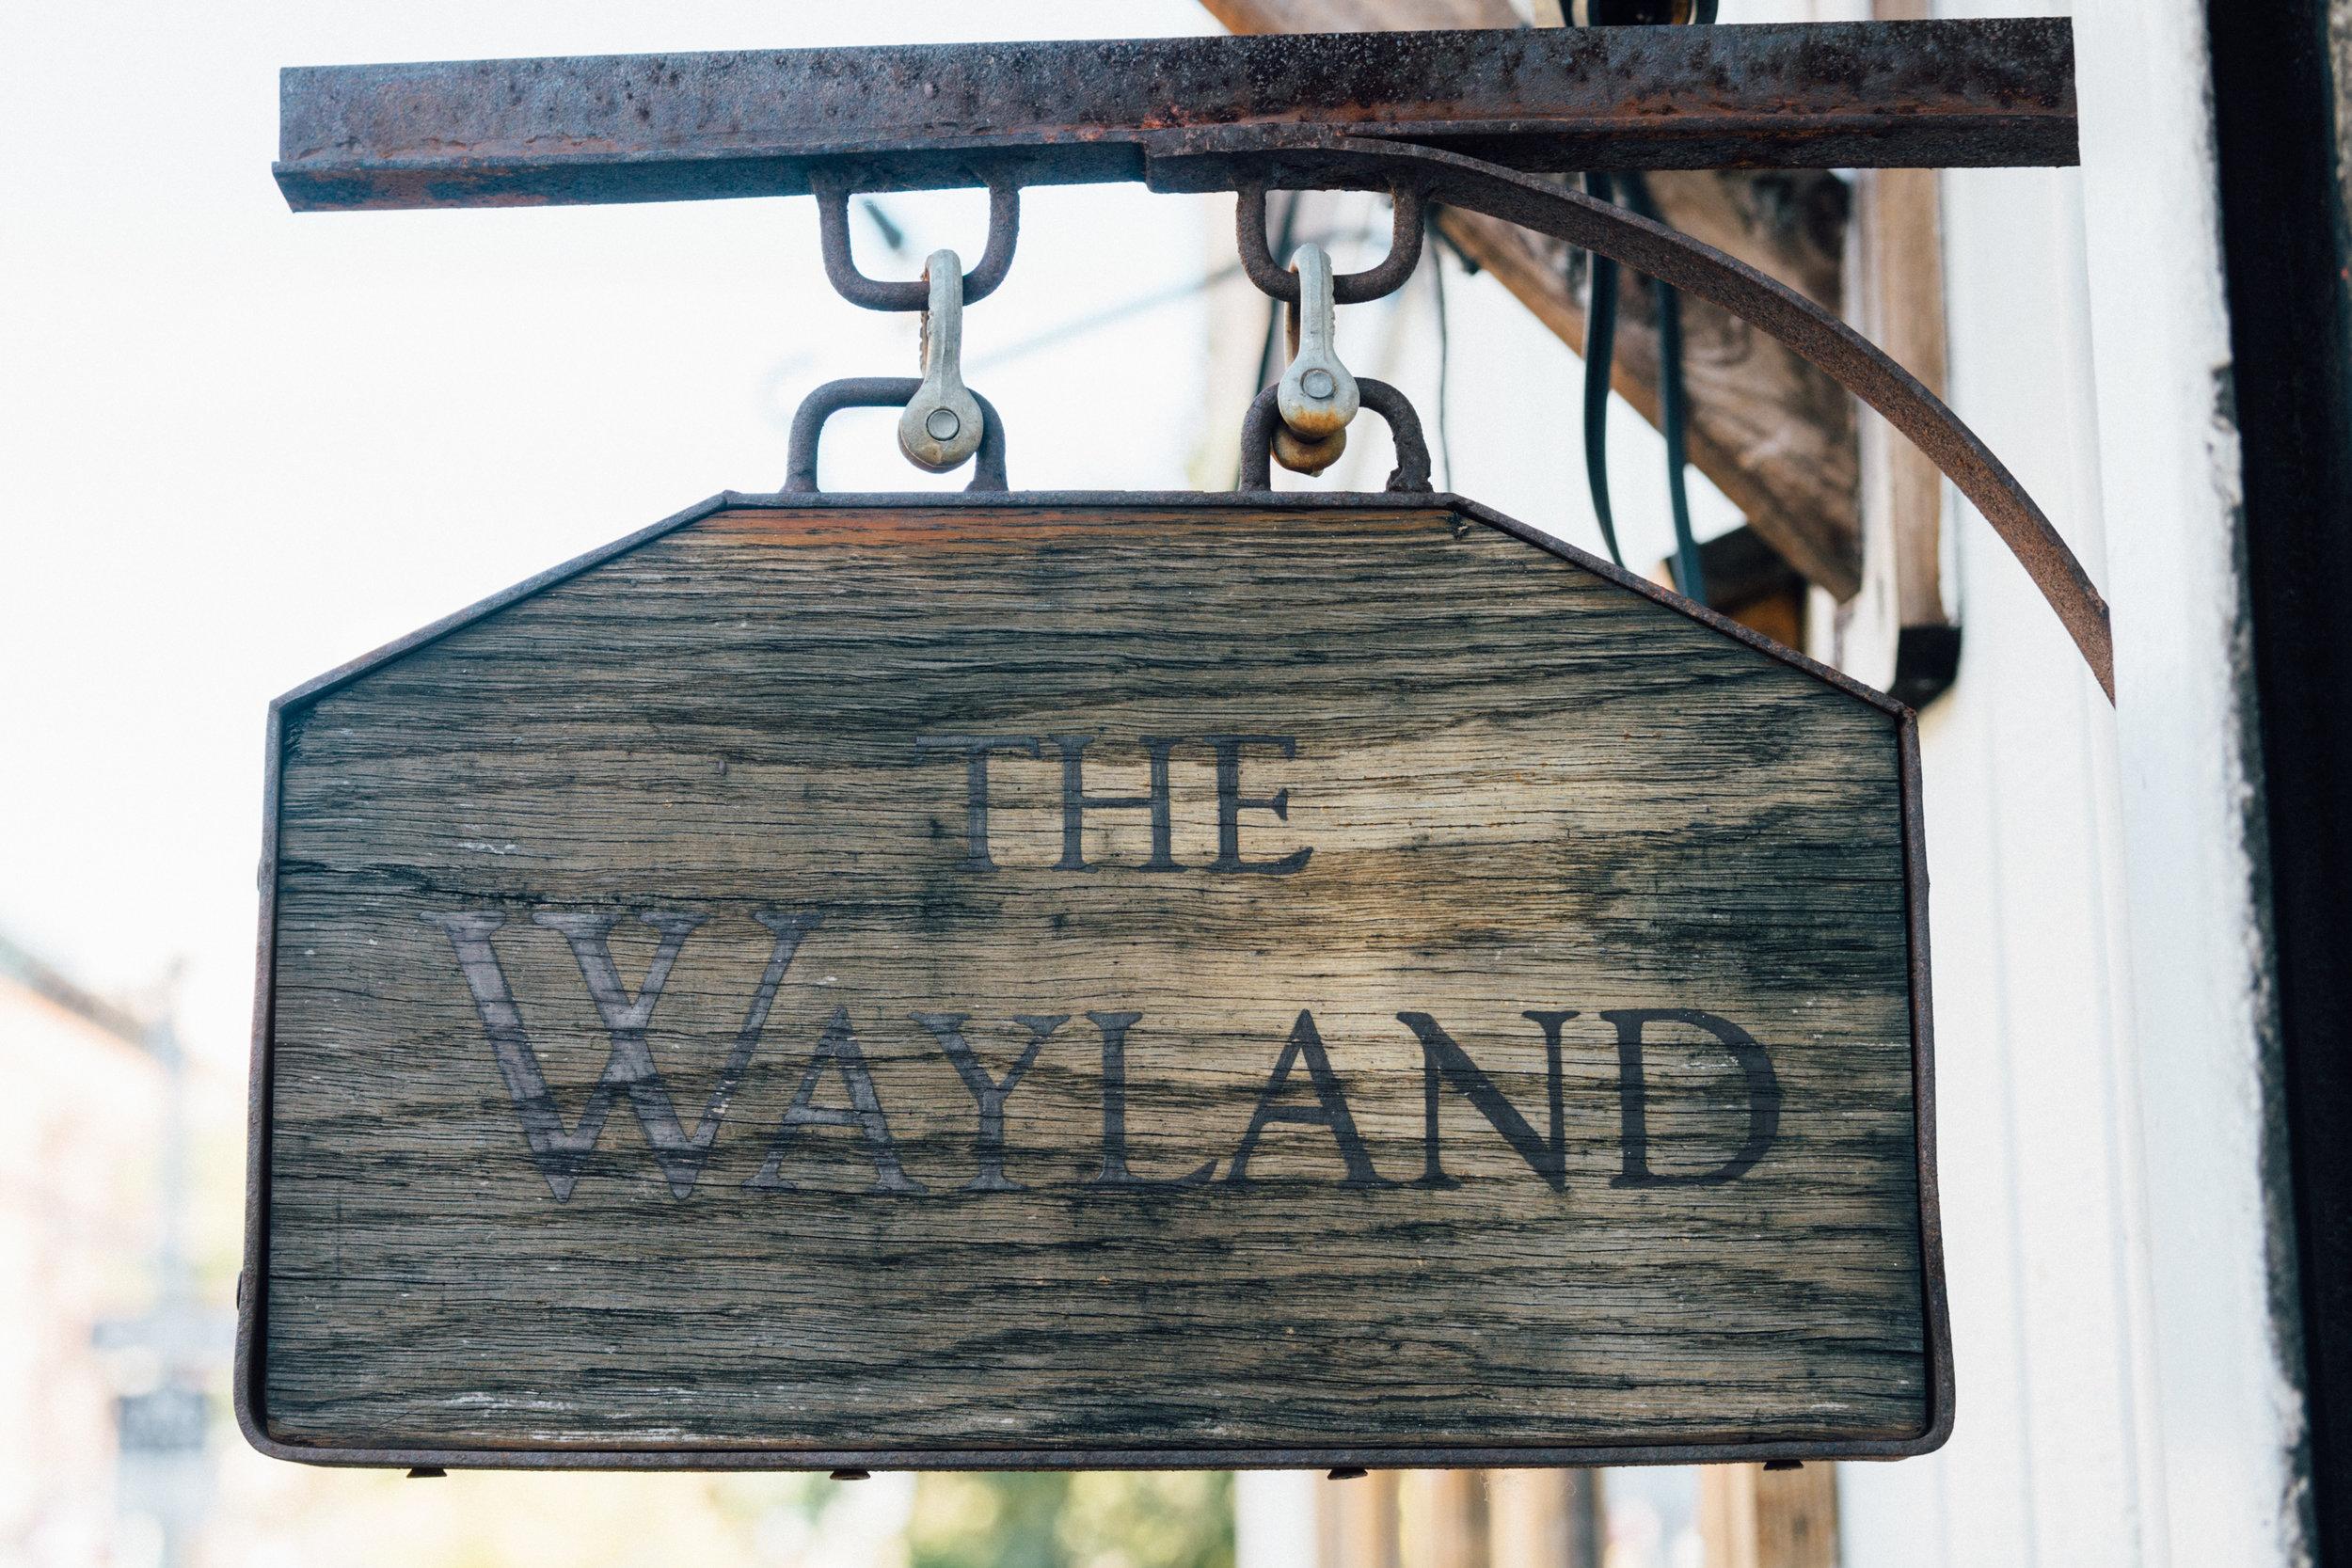 The Wayland (14 of 46).jpg